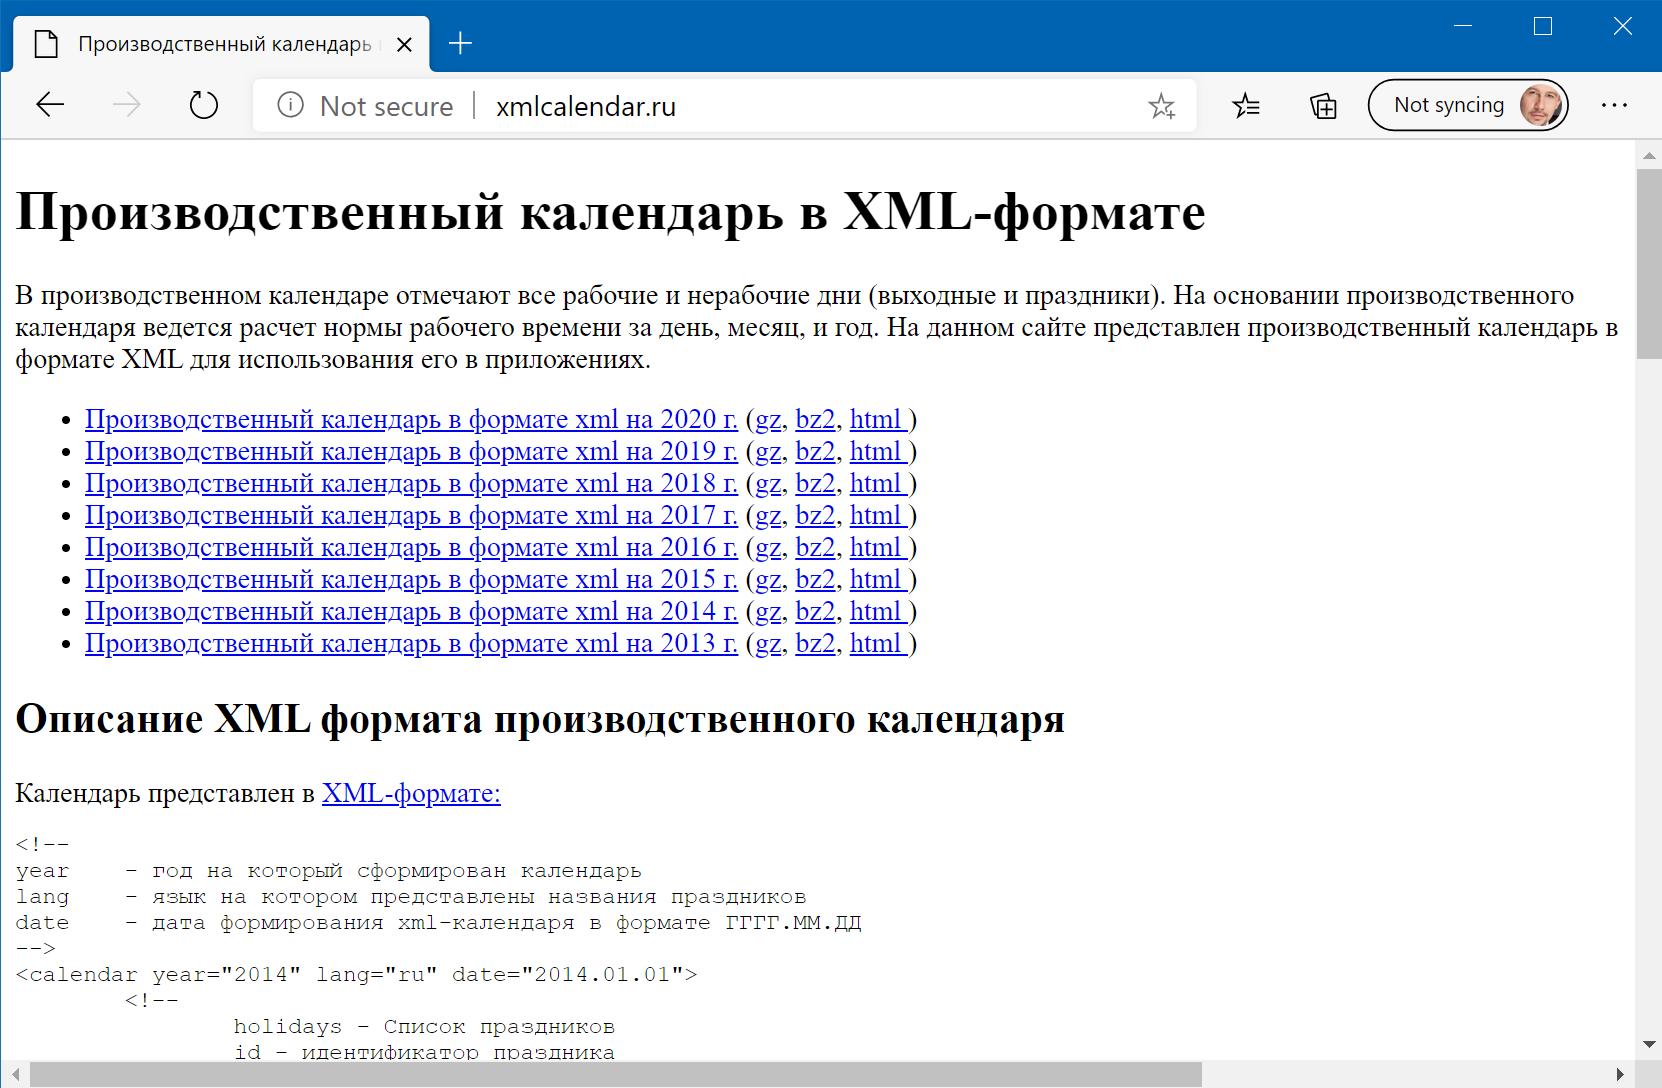 Сайт xmlcalendar.ru